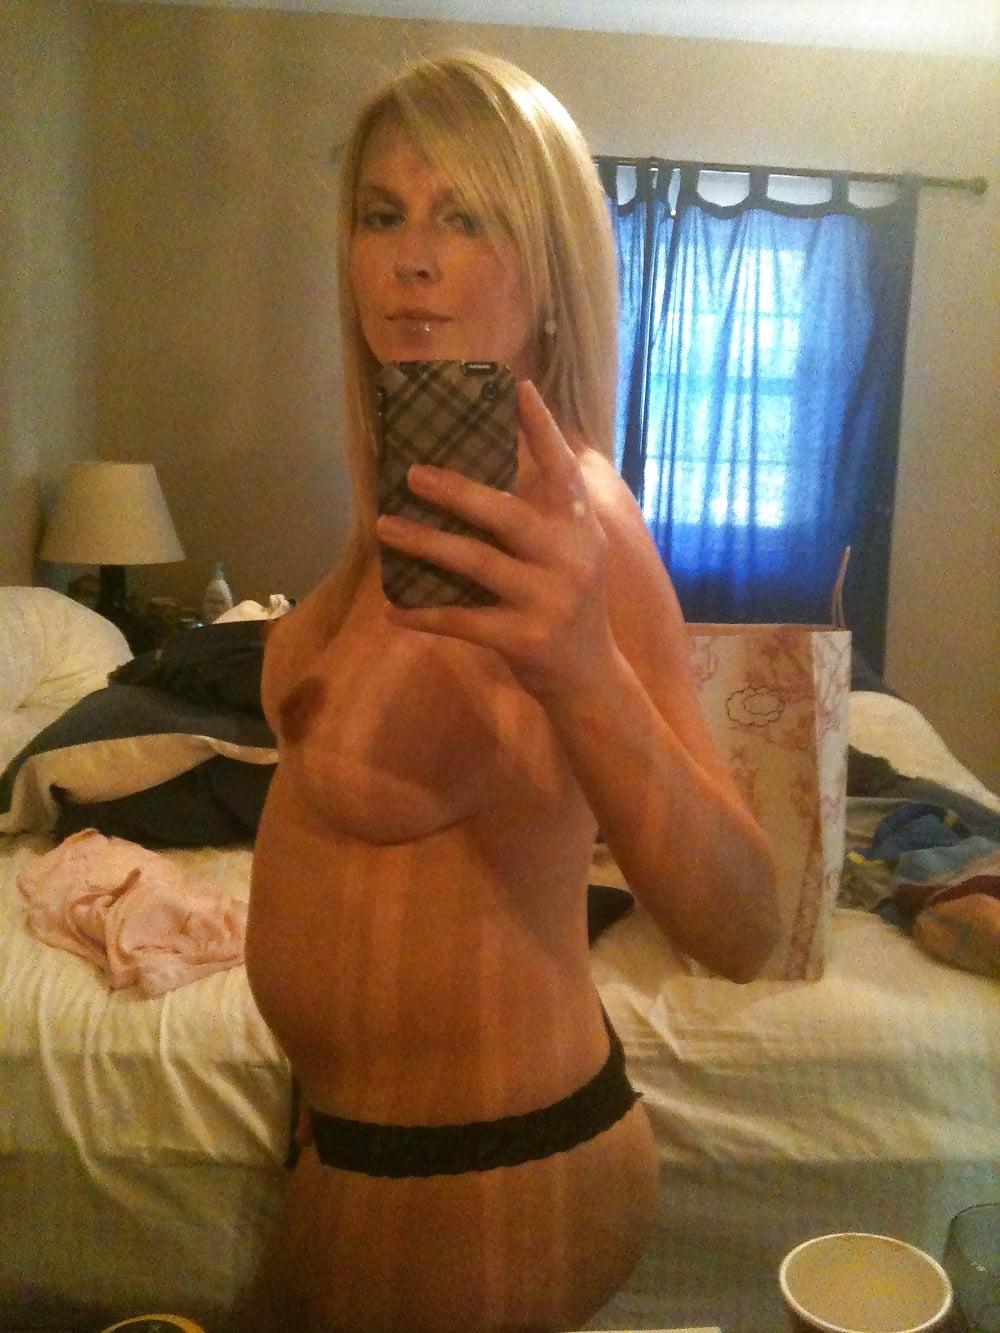 Amateur Porno Cutre see and save as amateur prego blonde porn pict - xhams.gesek